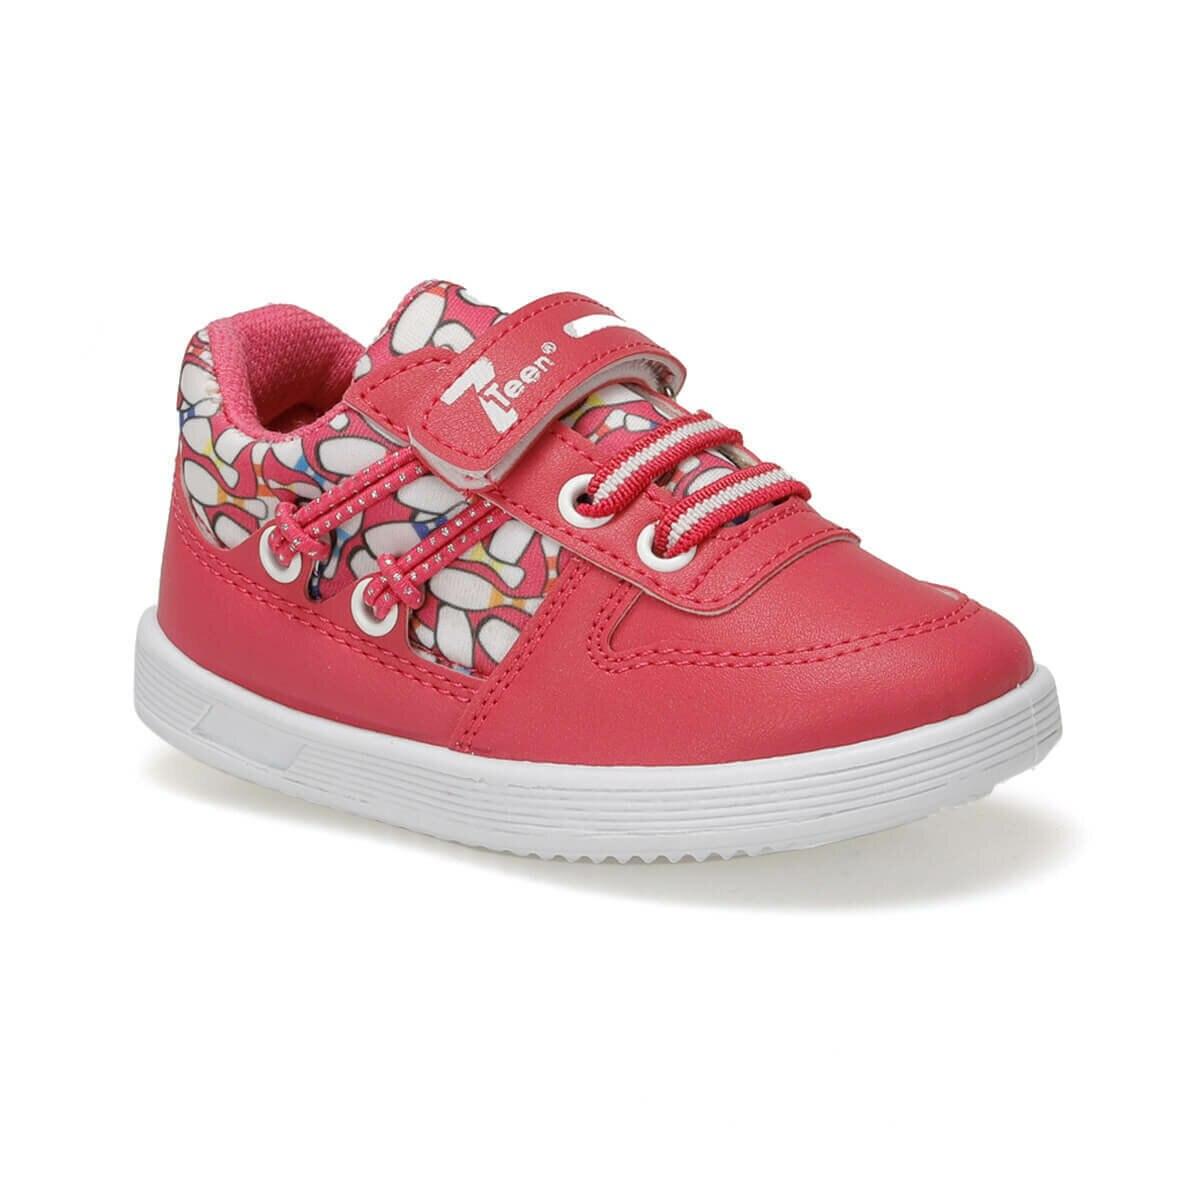 FLO WEENY Fuchsia Female Child Sneaker Shoes I-Cool